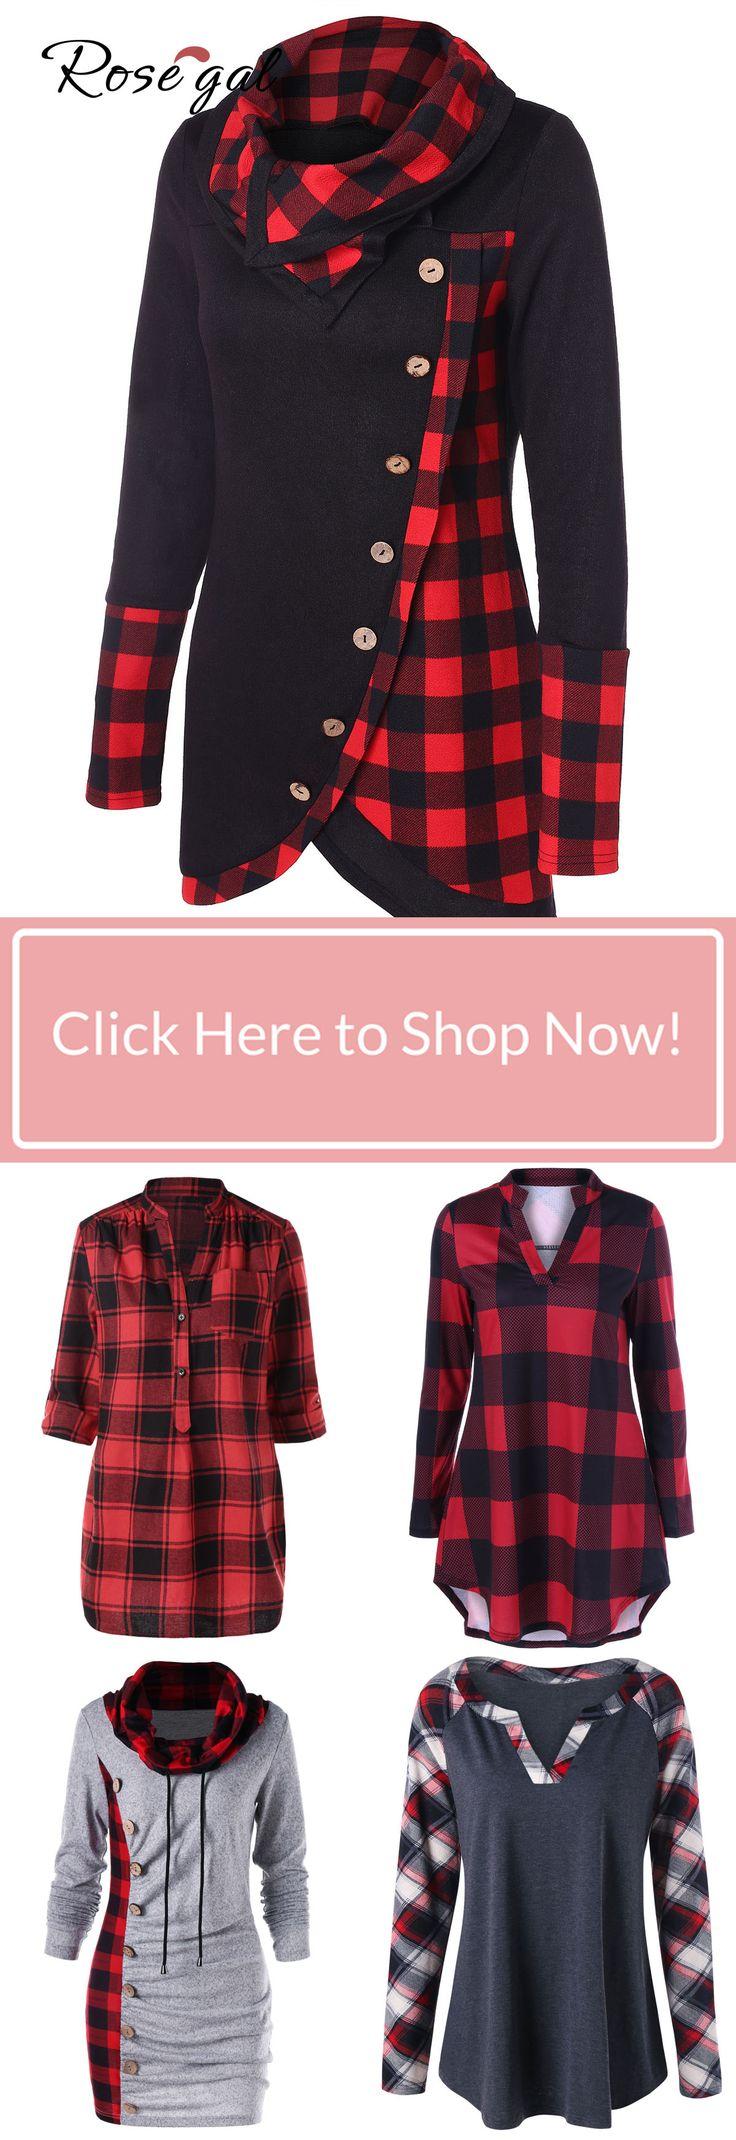 Turtleneck Tartan Asymmetrical Sweatshirt plaid blouses shirts ideas in rosegal.com 11